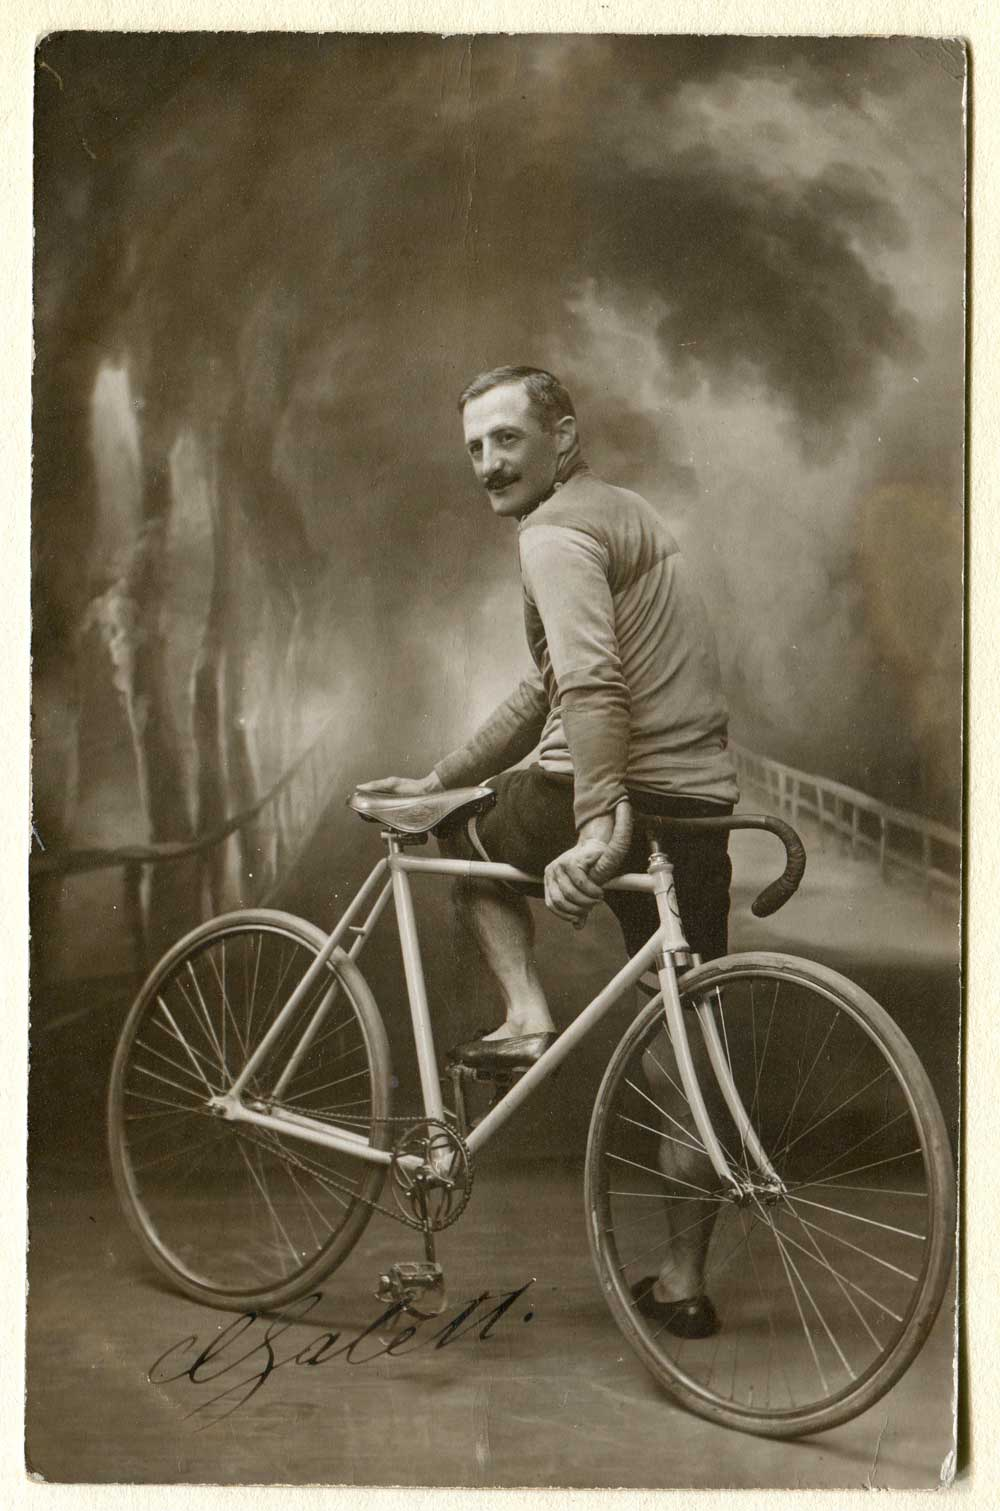 Carlo Galetti in bici